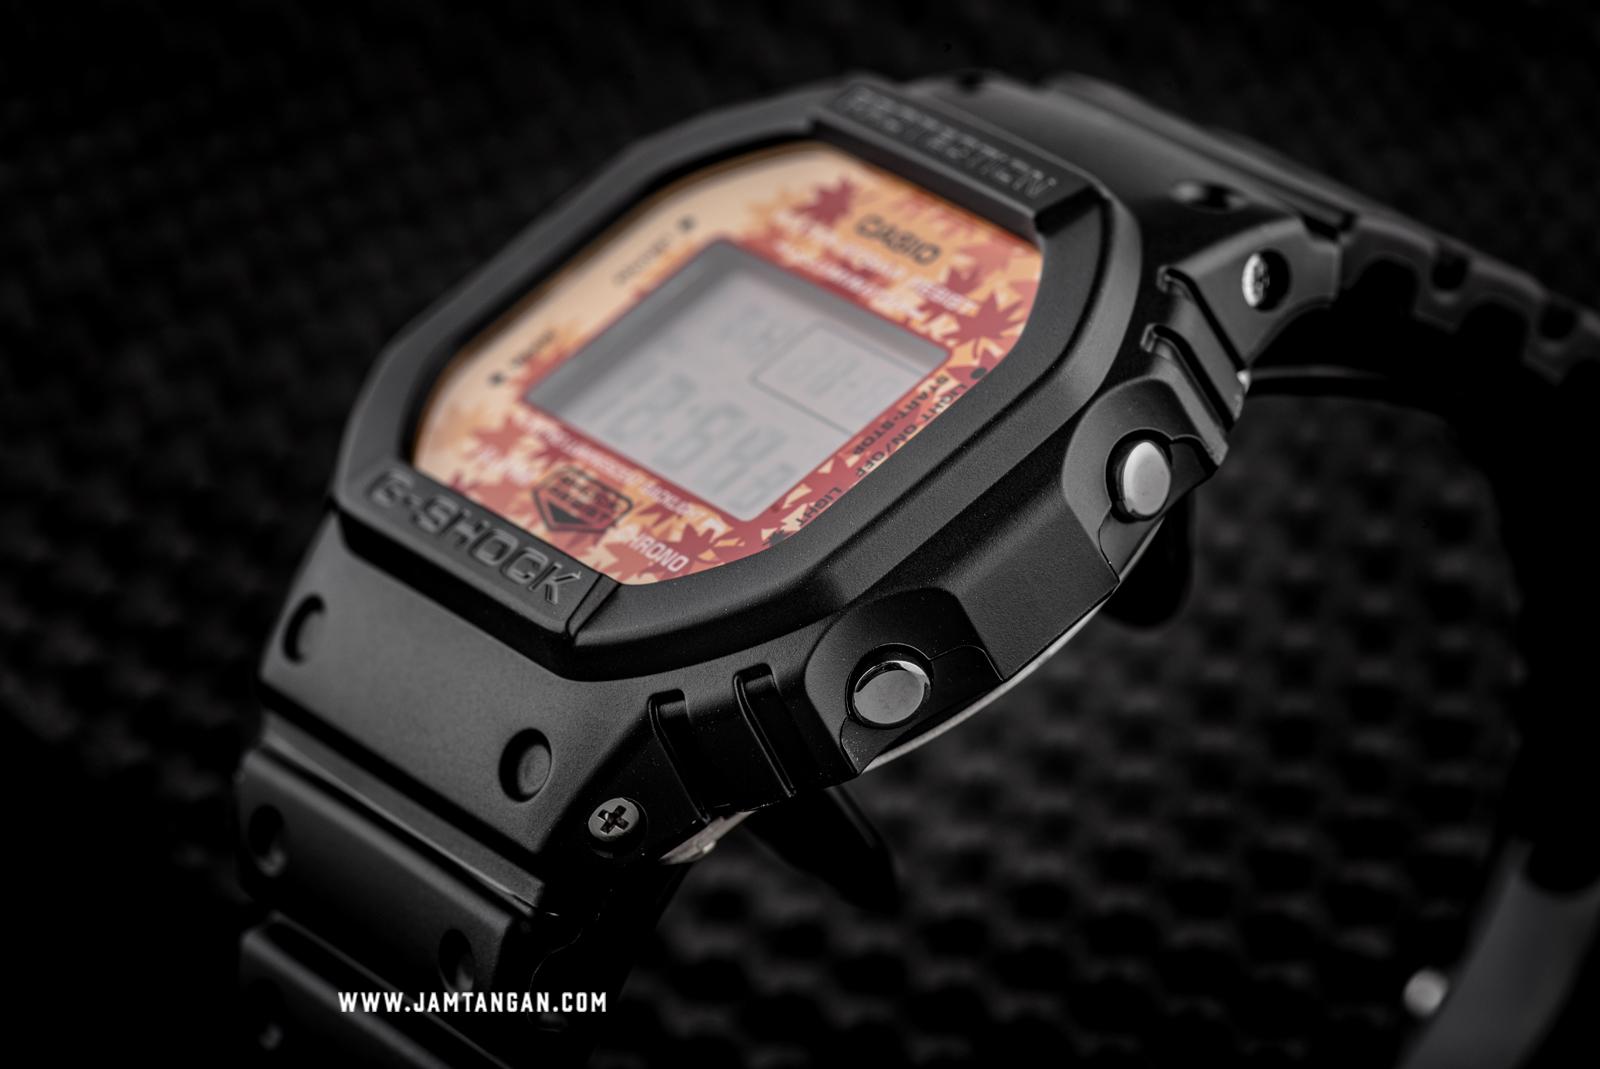 Casio G-shock DW-5600TAL-1JR Kyo Momiji Colour Autumn Series Digital Dial Black Resin Strap Machtwatch